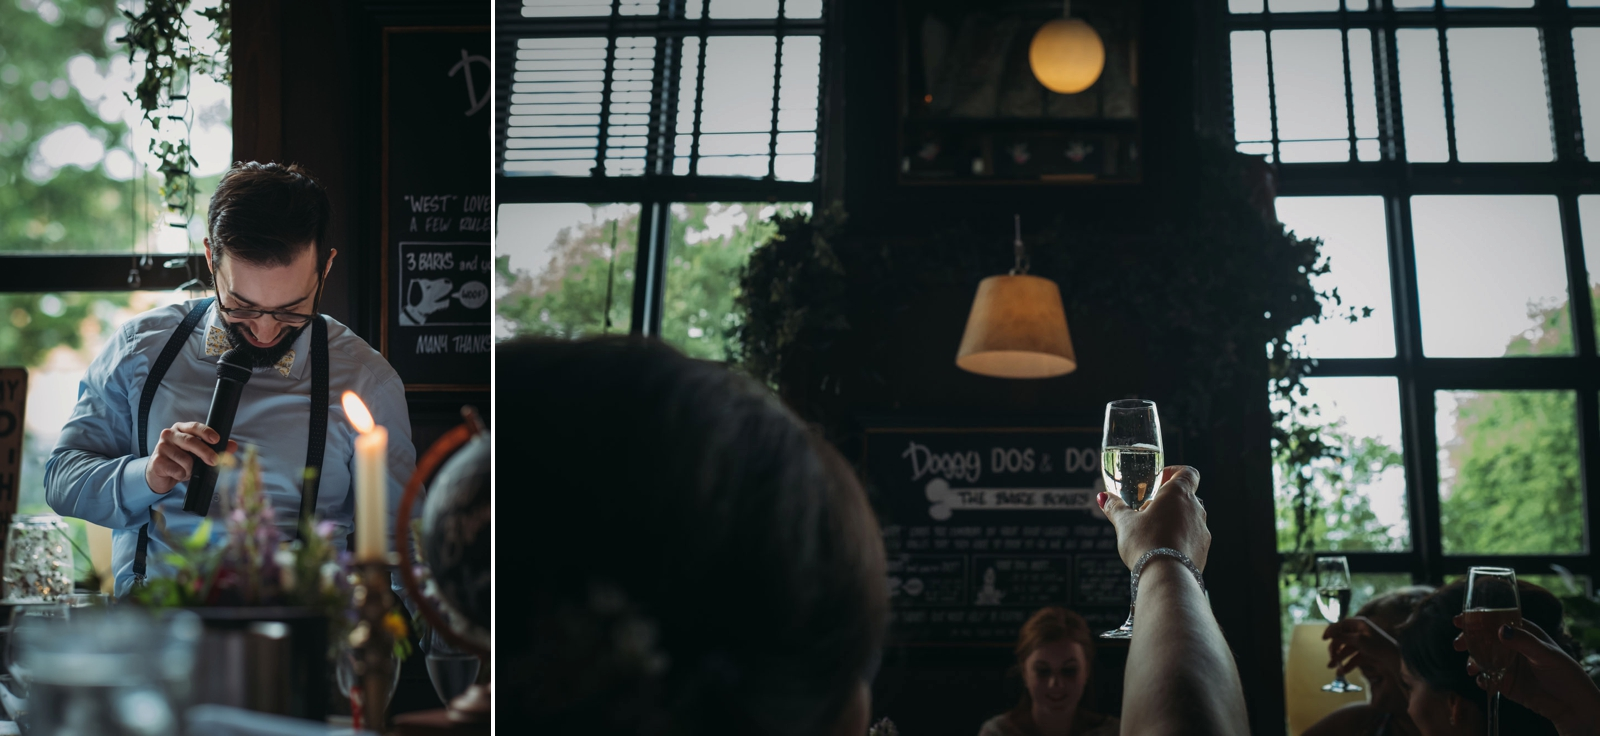 Gillian-Evan-West-Brewery-Jo-Donaldson-Photography-497.jpg